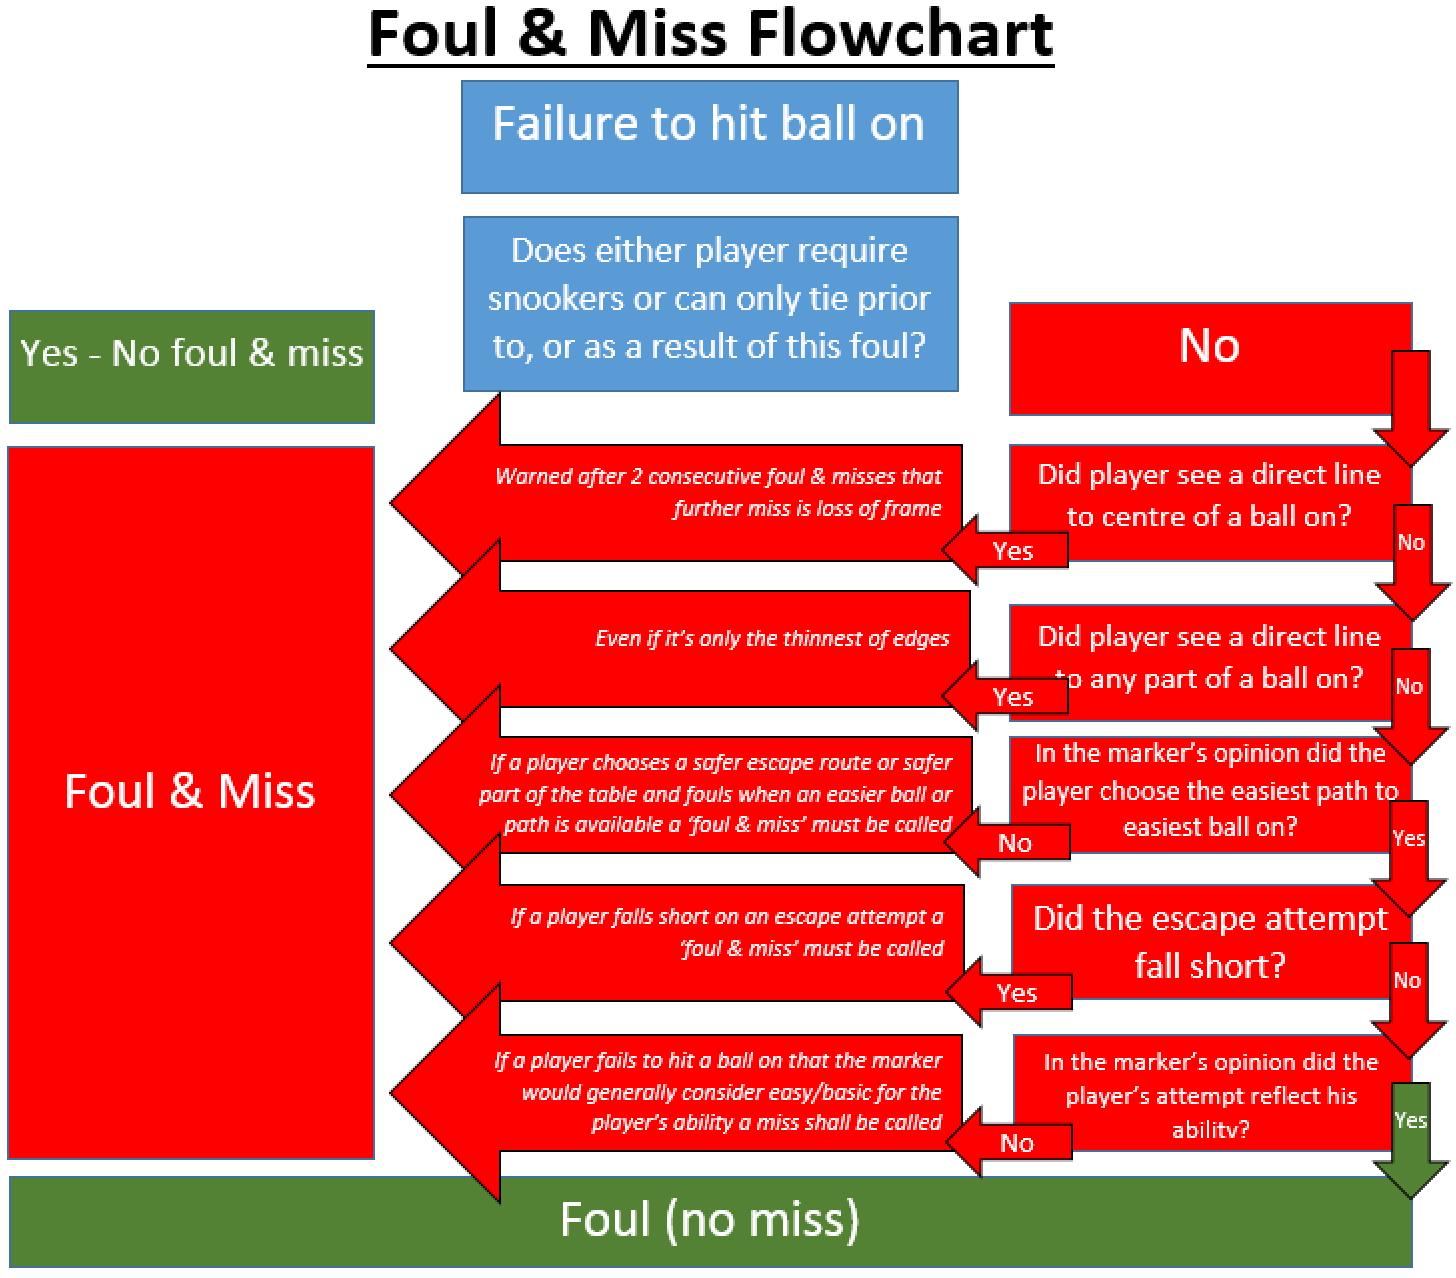 Foul & Miss Flowchart